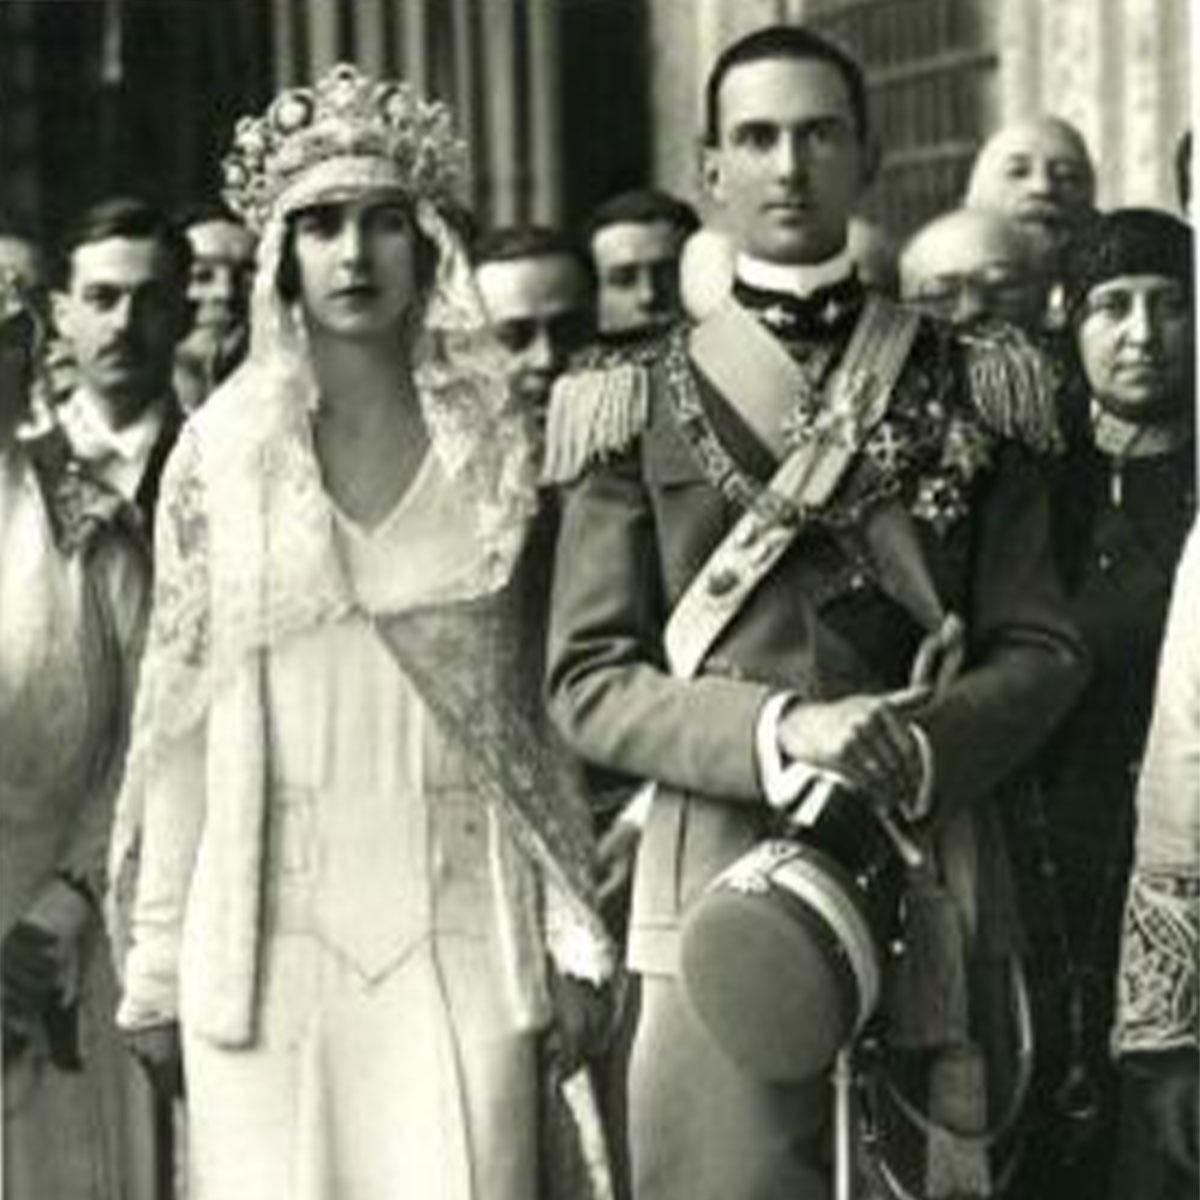 Principe Umberto e la Principessa Iolanda di Savoia